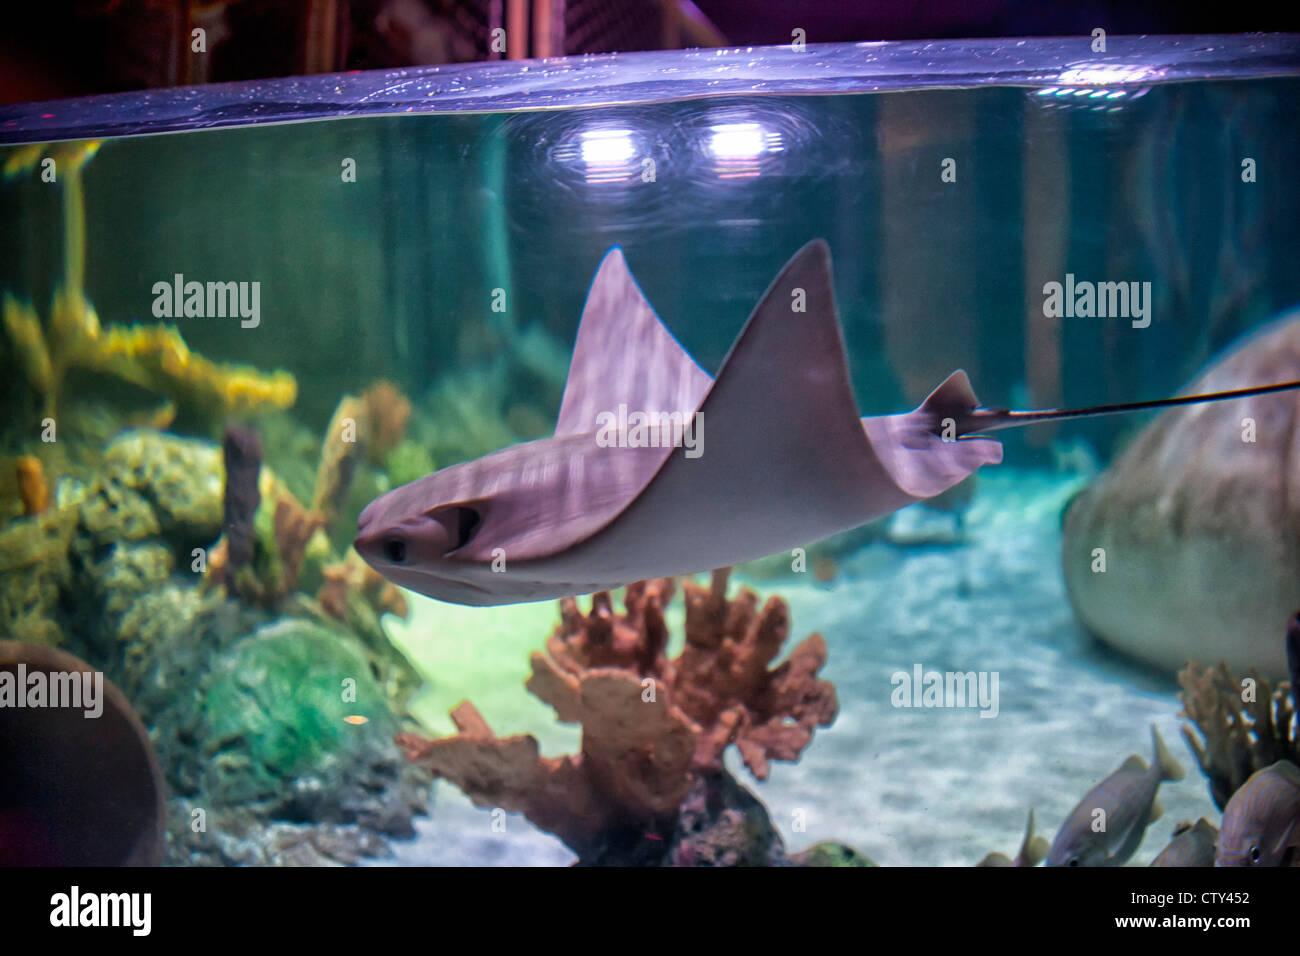 Freshwater fish kansas city - Sea Life Kansas City Aquarium